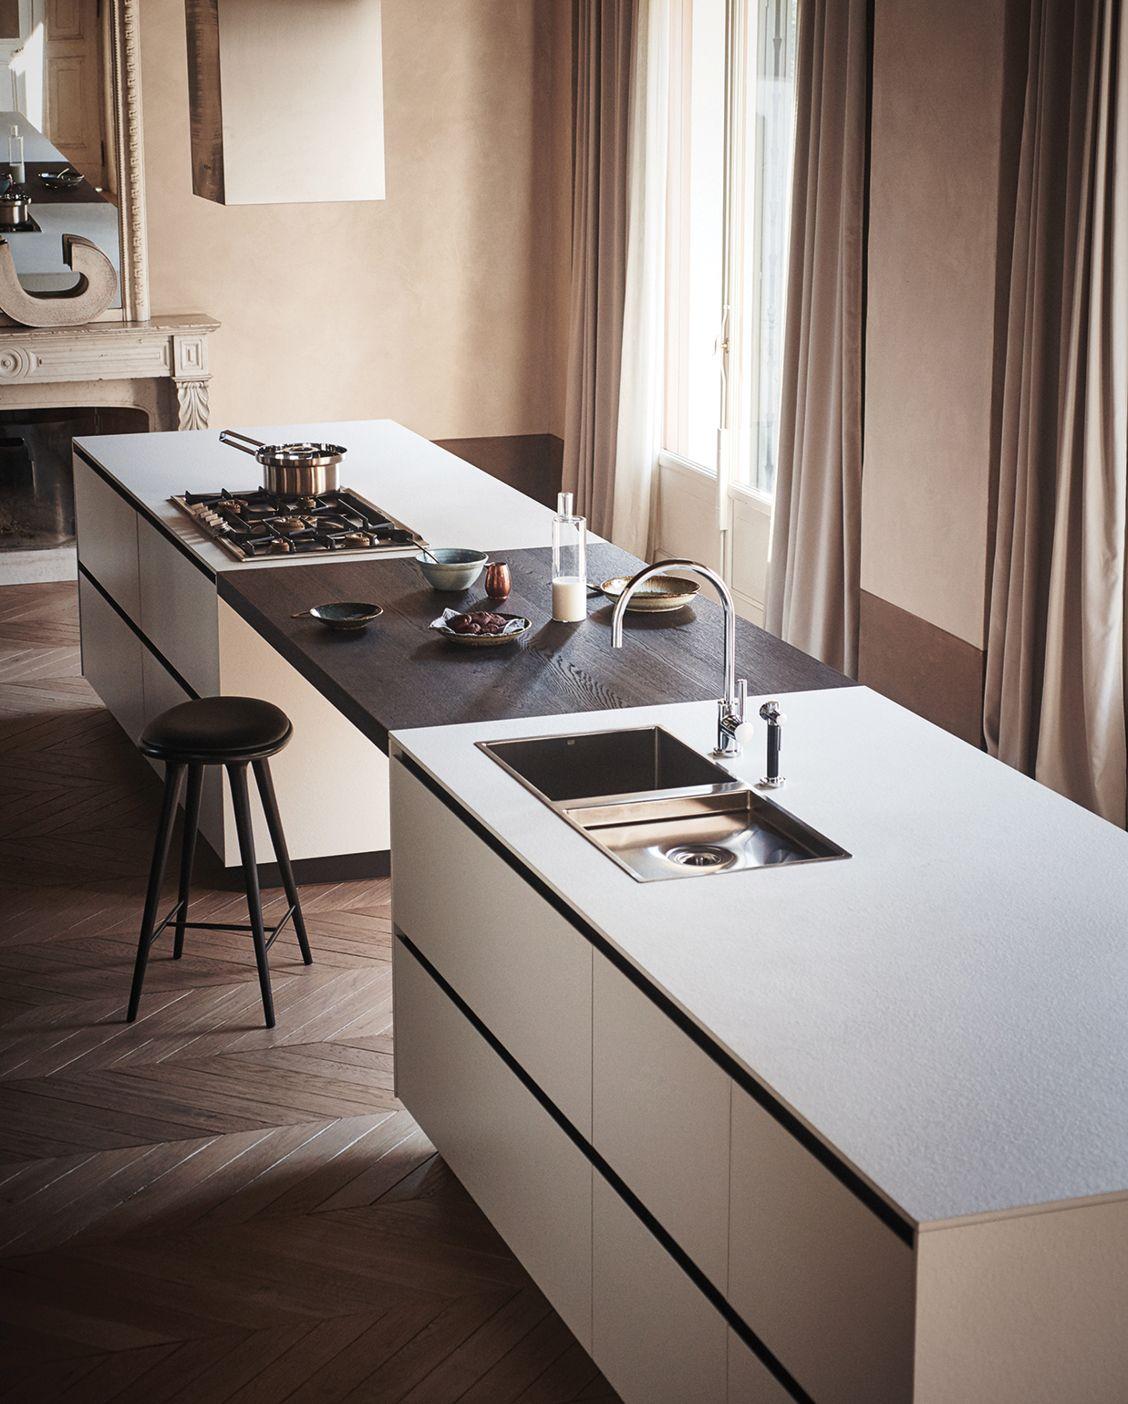 Maxima Pure Cuisine Decoration Cuisine Moderne Cuisines Design Cuisine Moderne